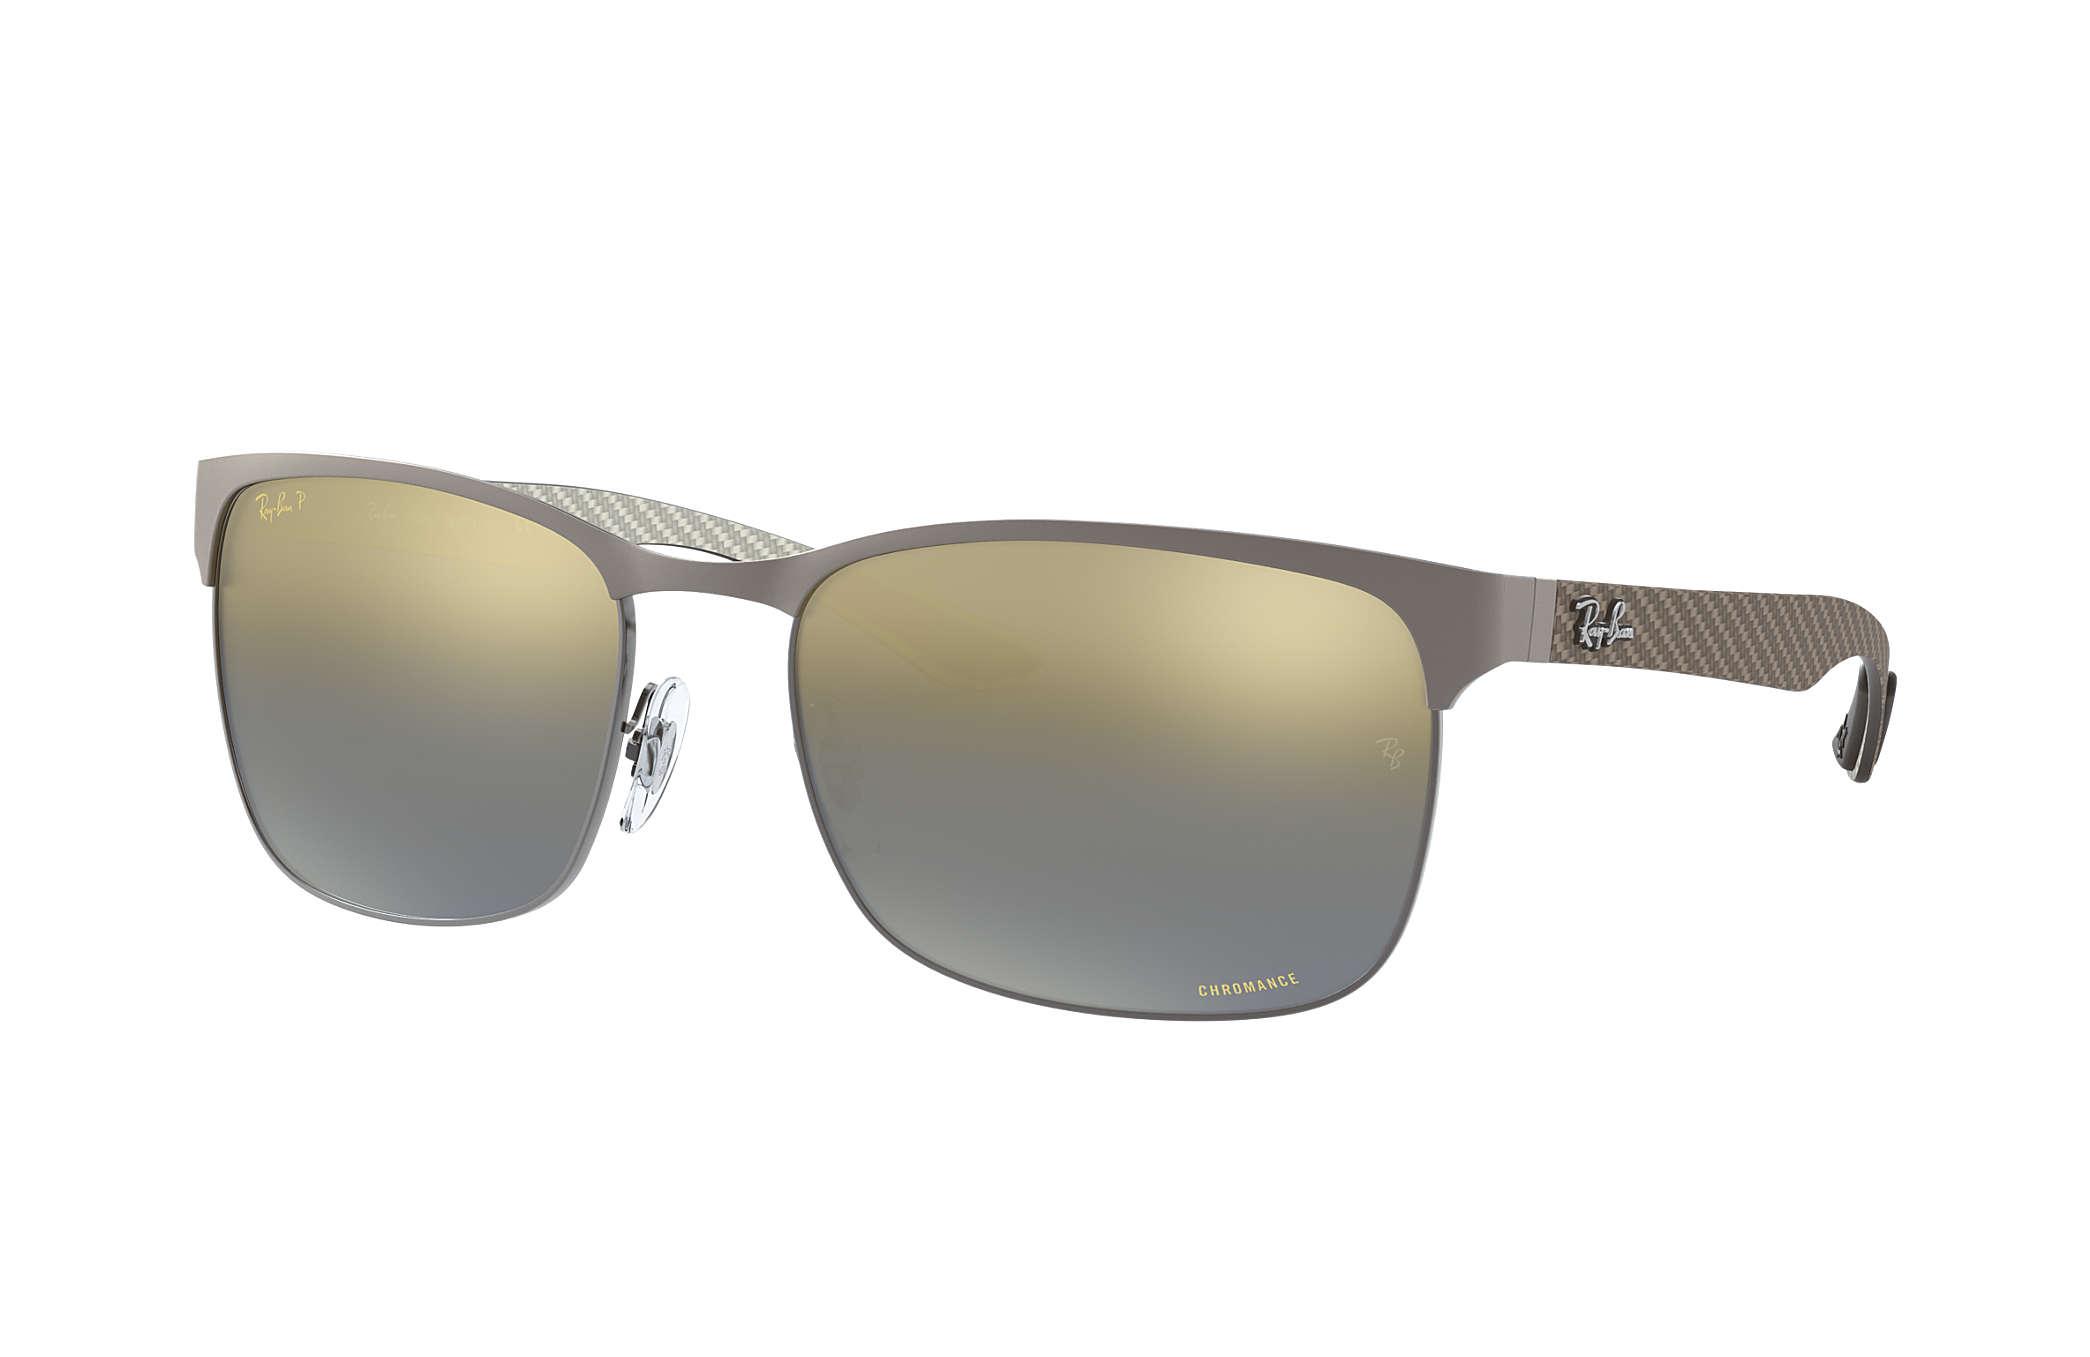 f76b8b5ba4d Chromance Sunglasses